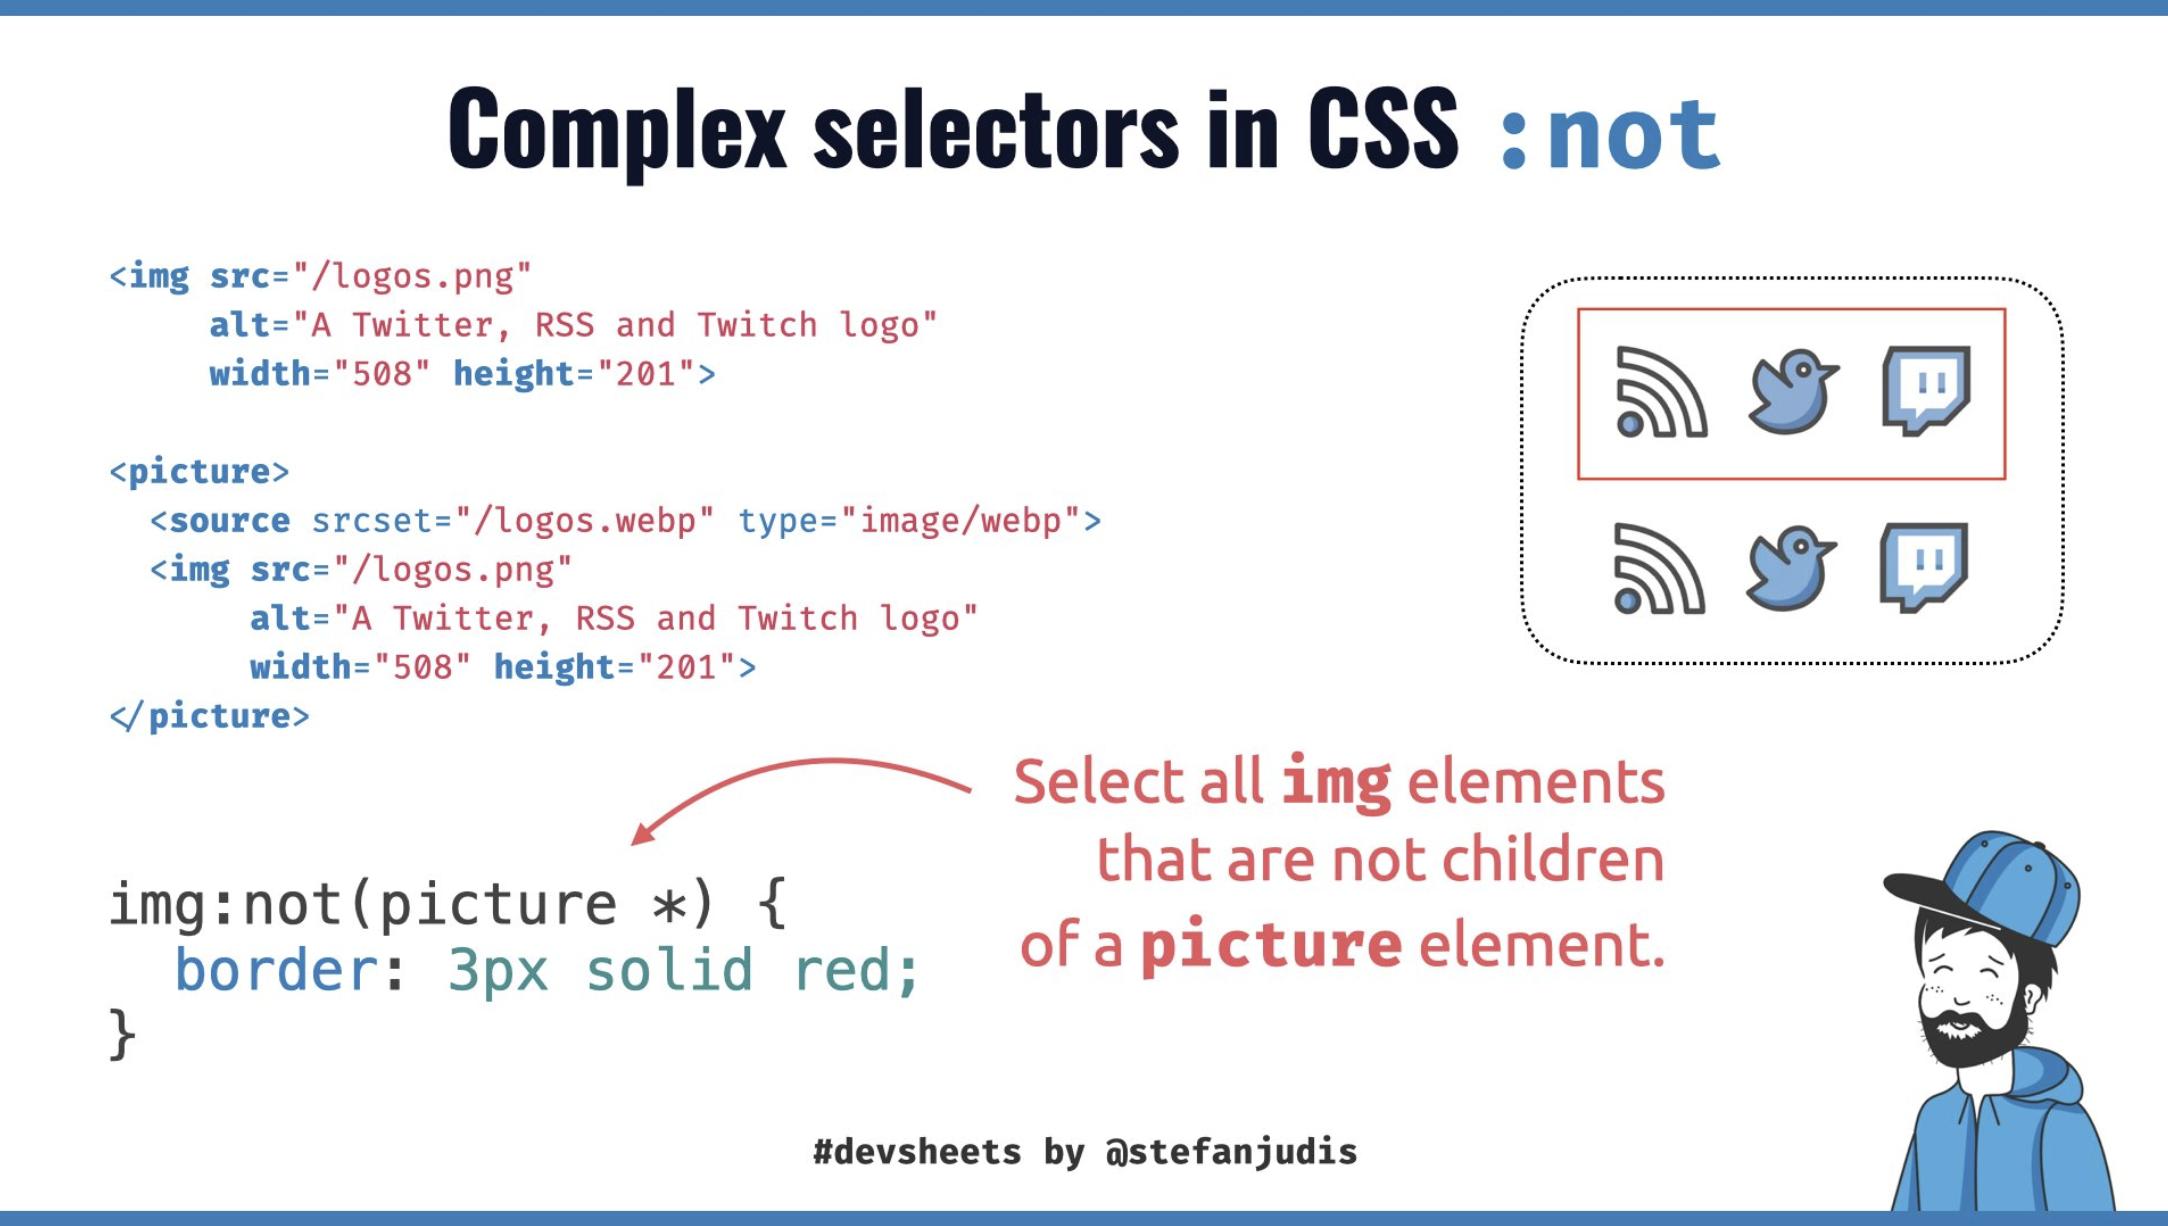 DevSheet explaining complex selectors in CSS not